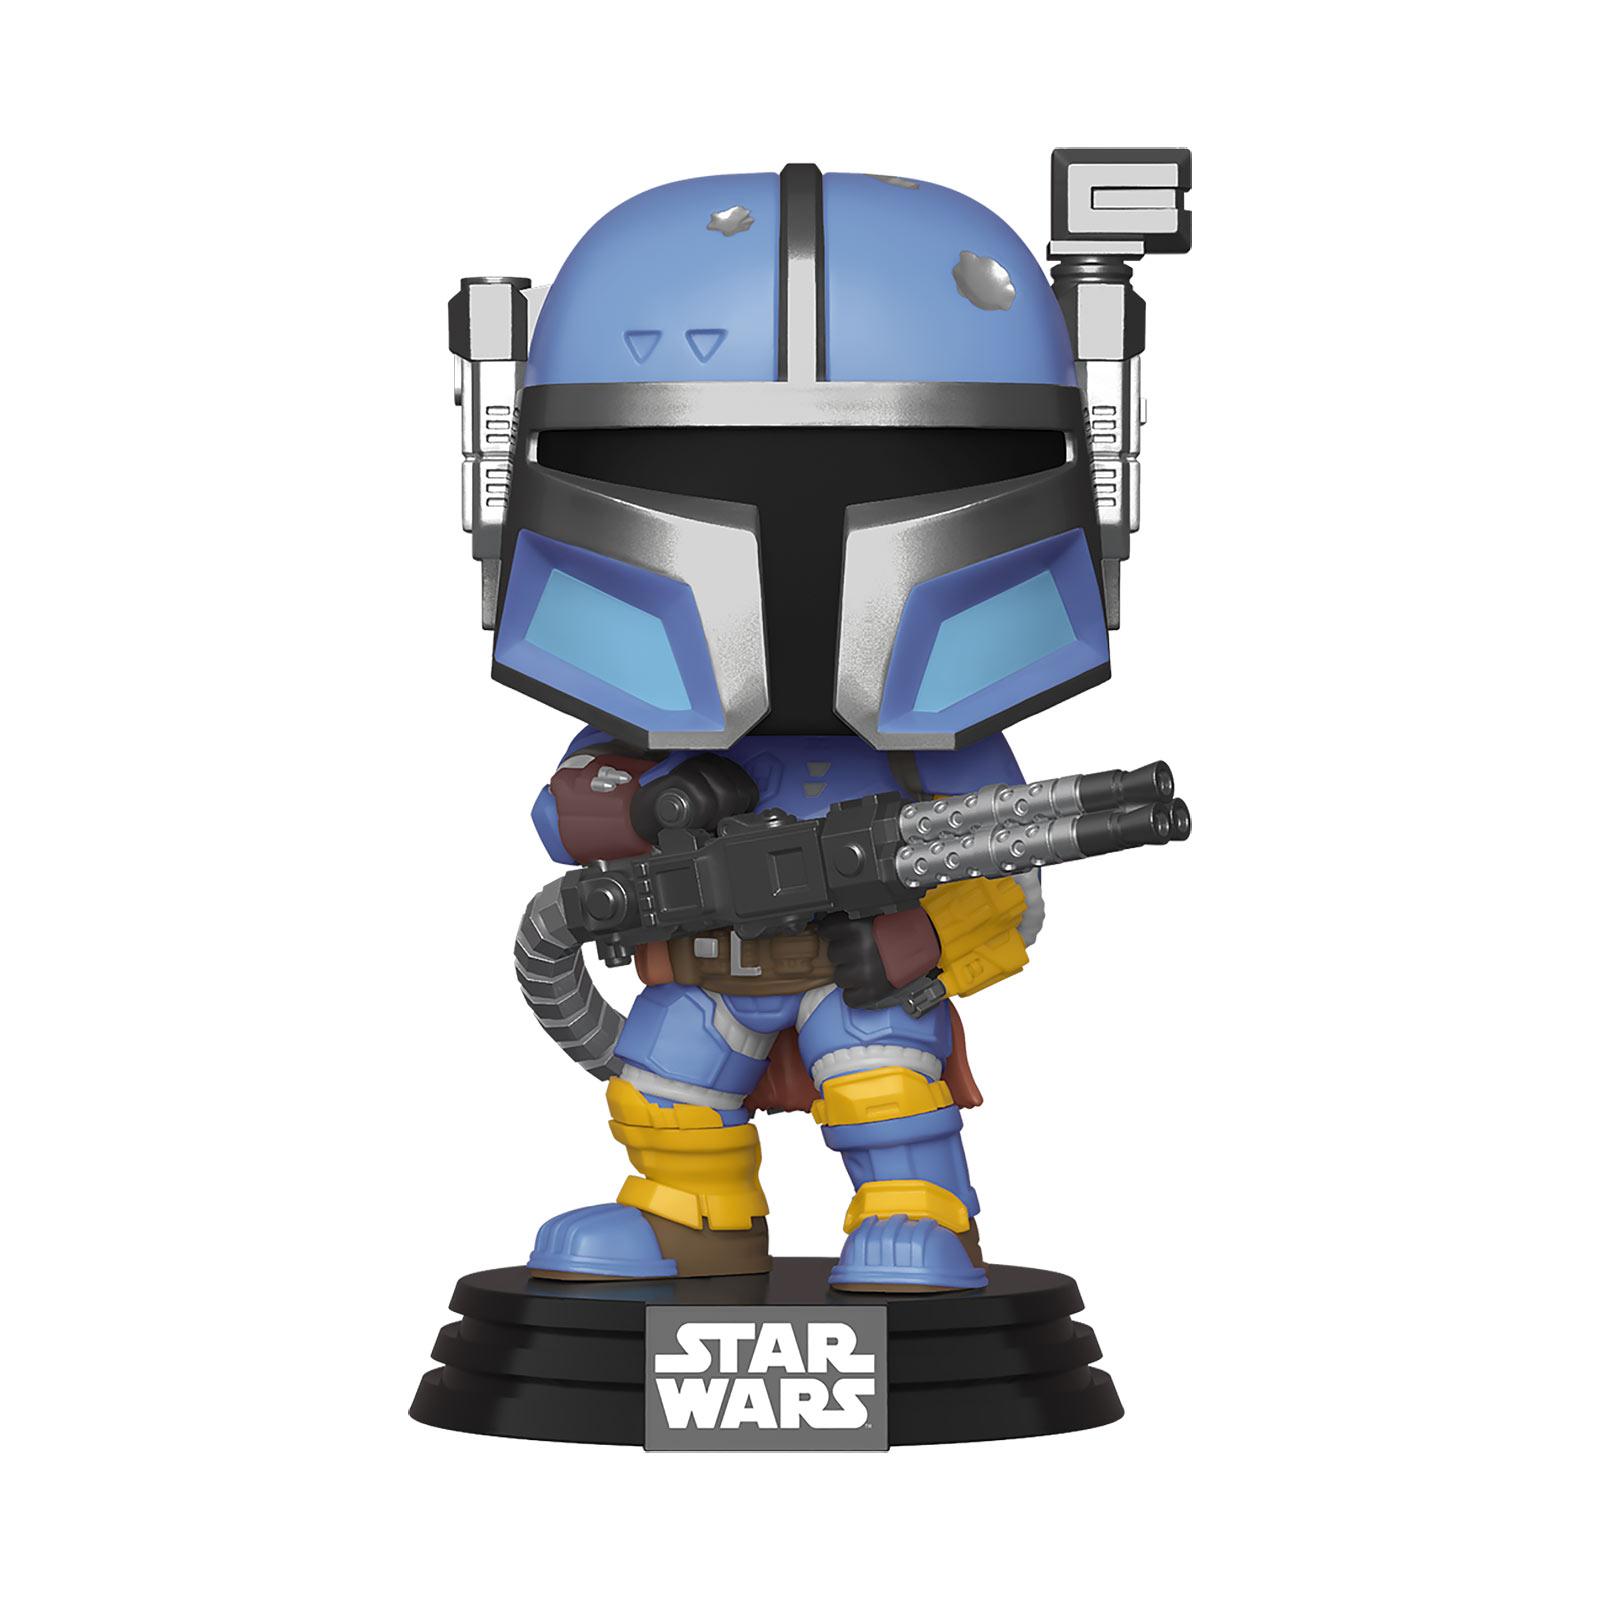 Heavy Infantry Mandalorian Funko Pop Wackelkopf-Figur - Star Wars The Mandalorian